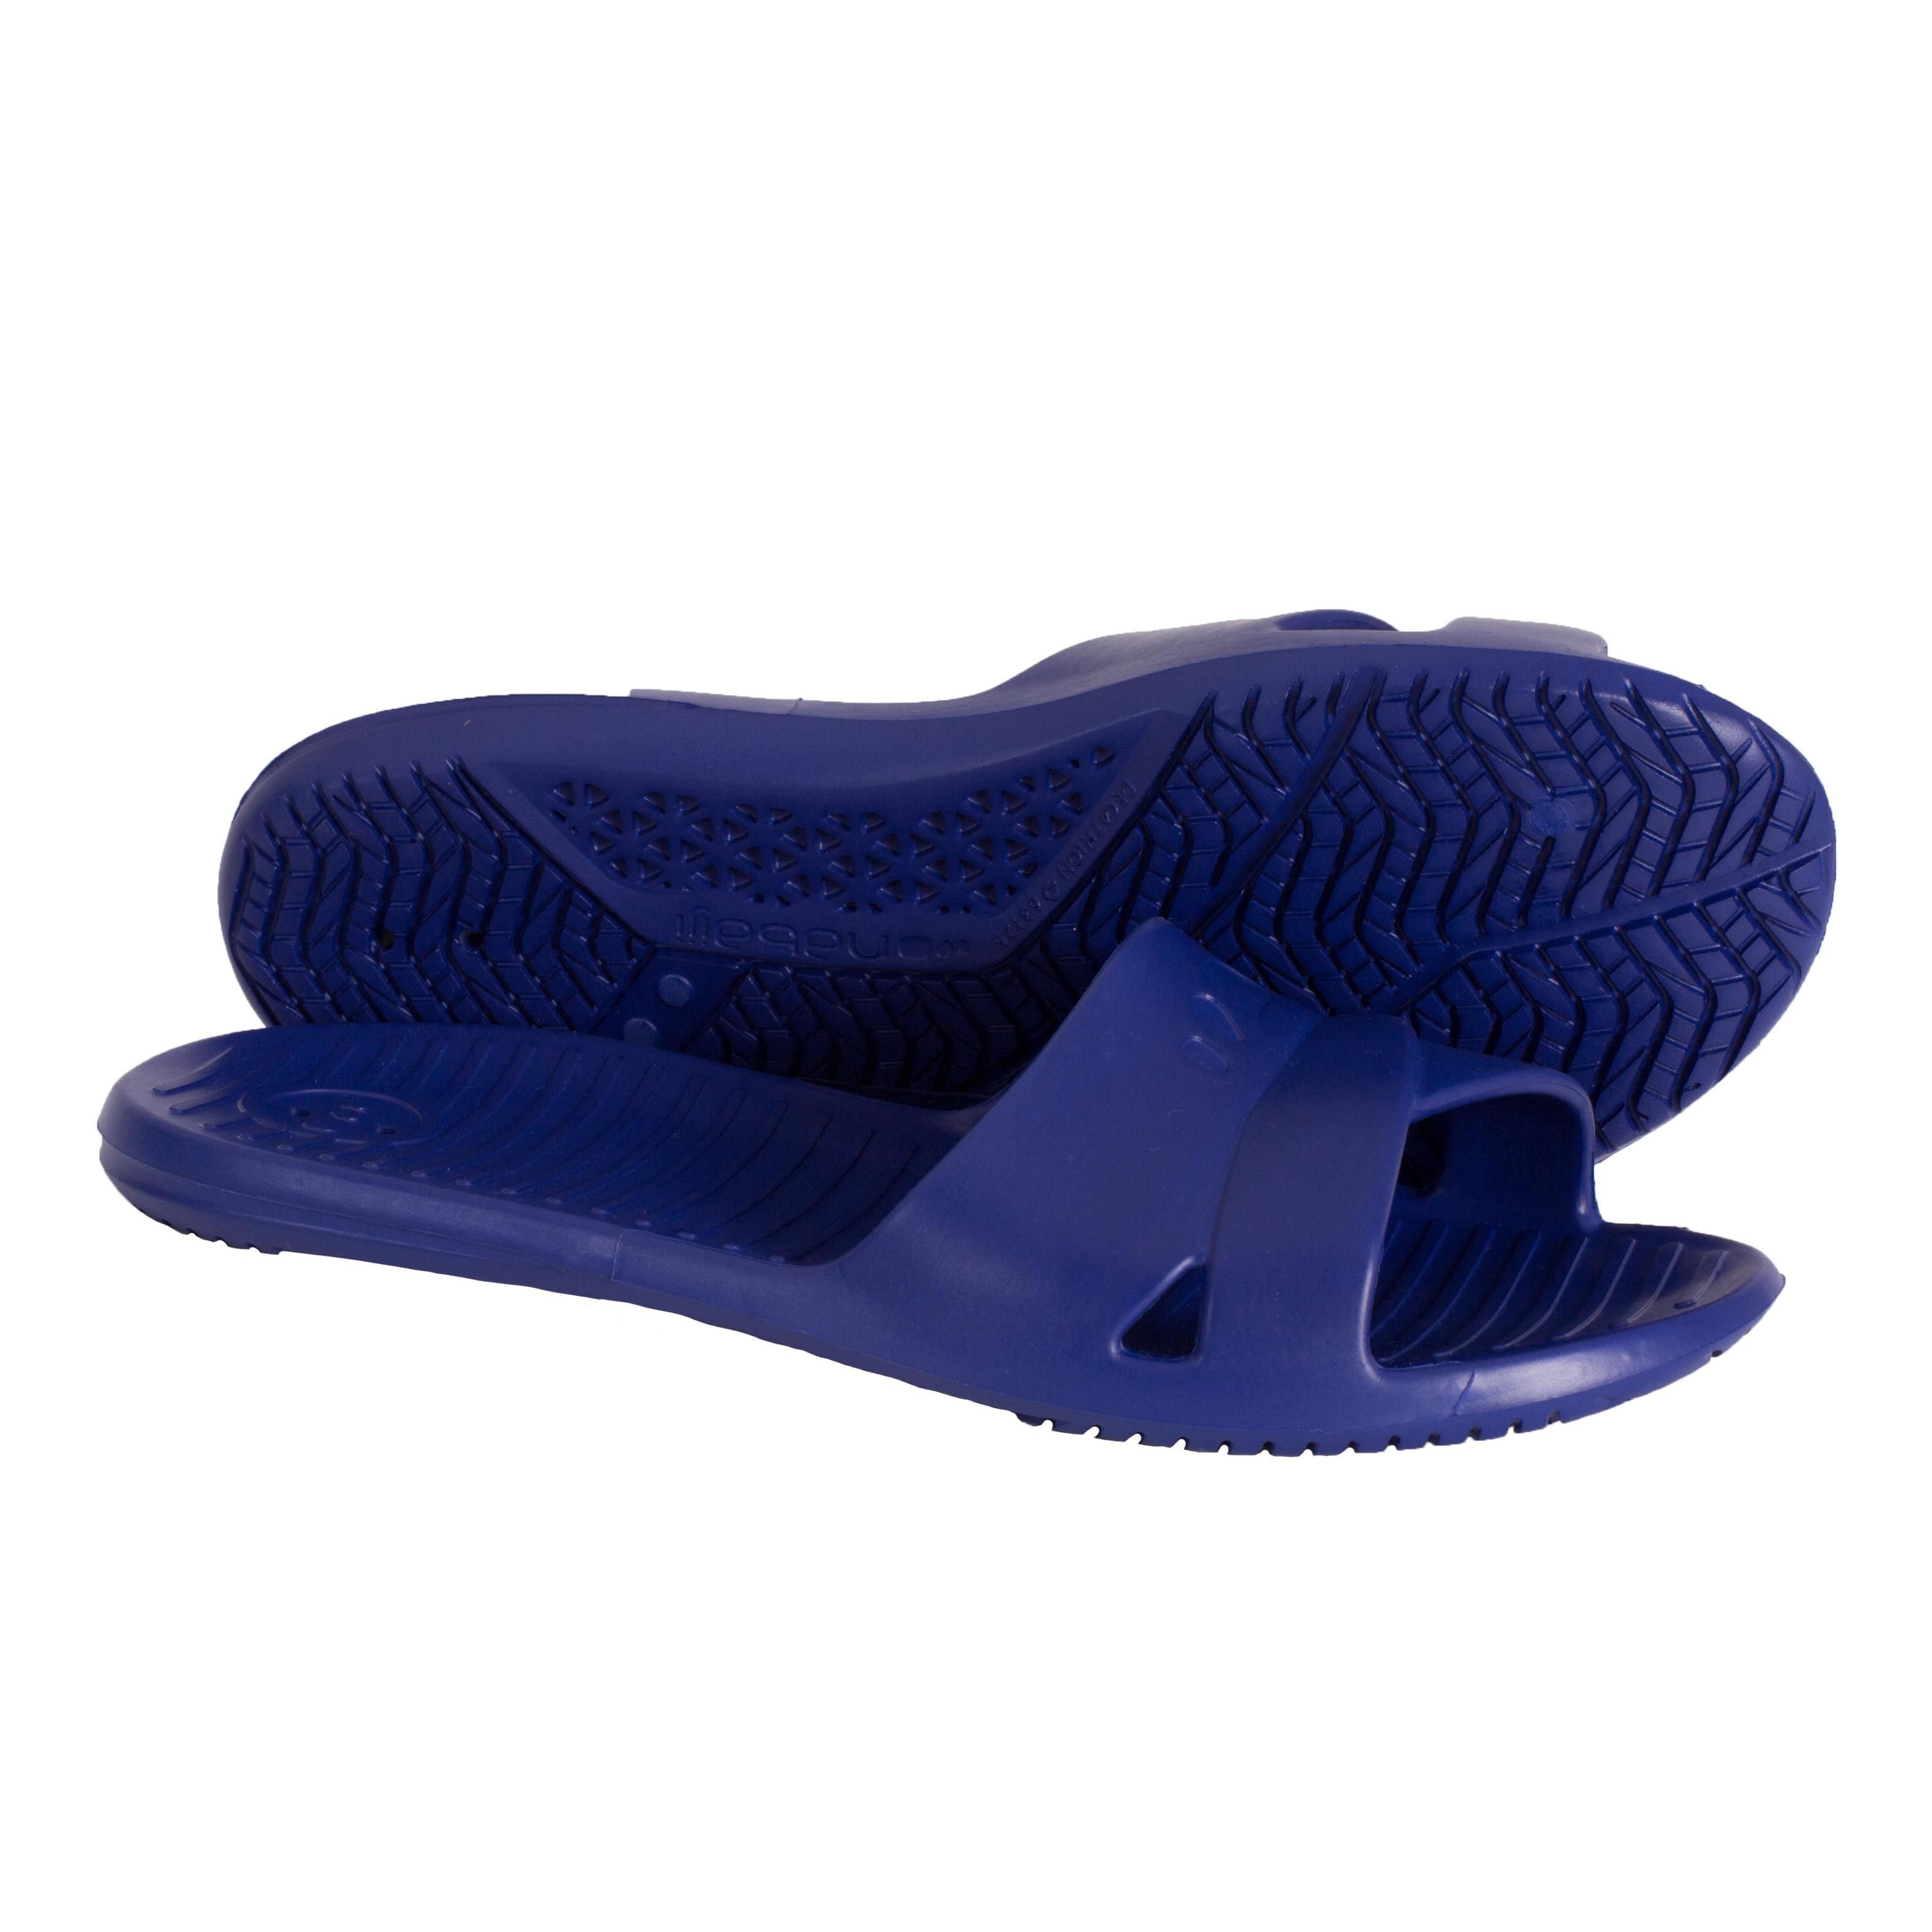 Nabaiji Badsandalen voor dames Slap 100 Basic donkerblauw